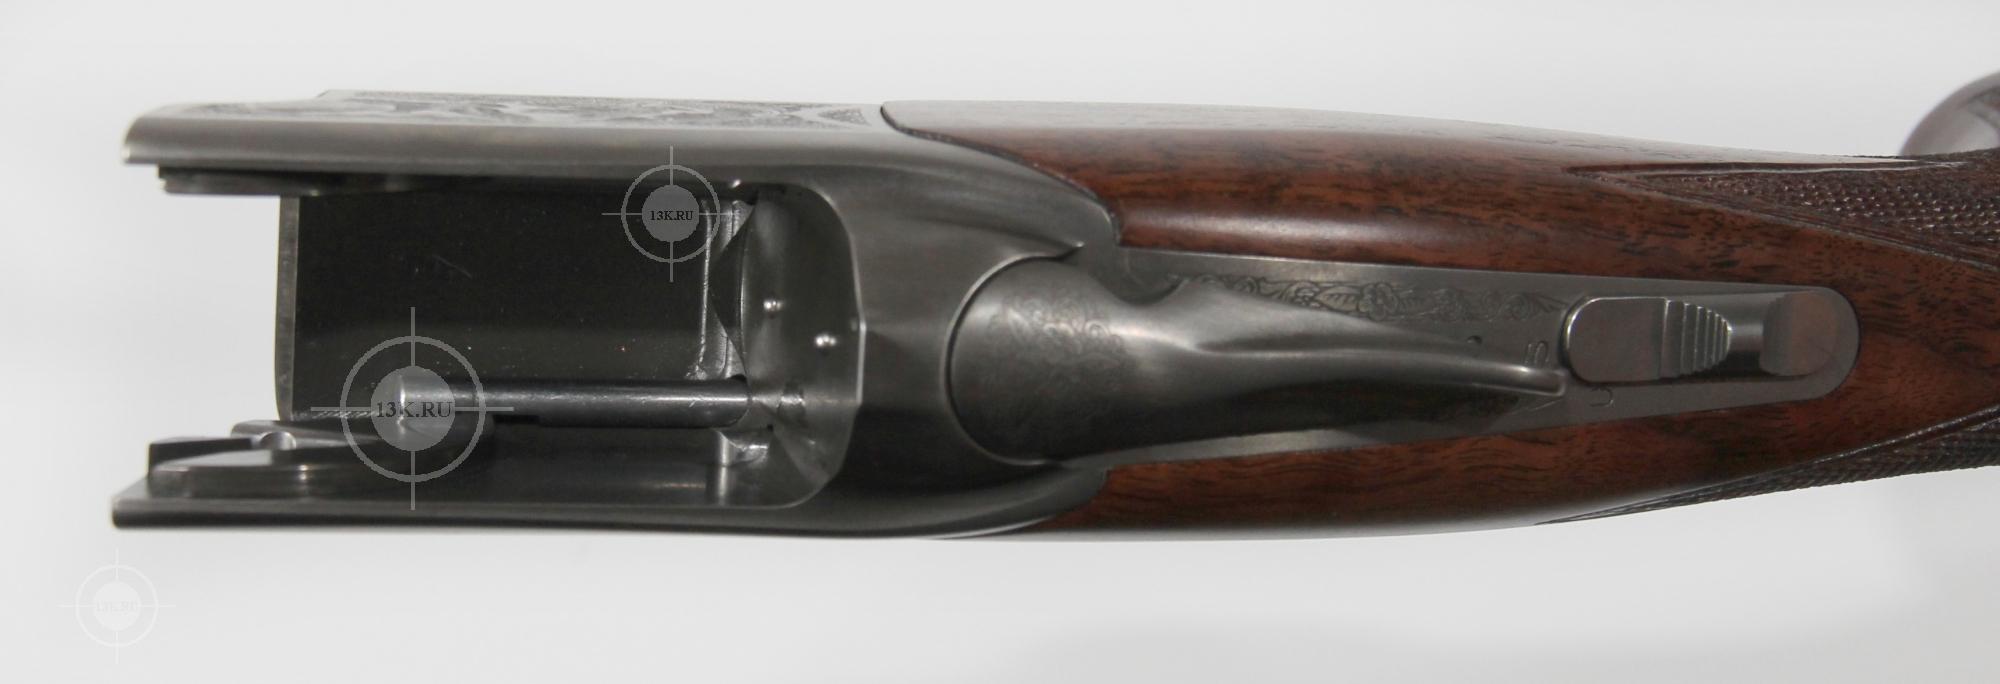 Browning cynergy hunter gr3 кал 20 76 760 мм дн кейс